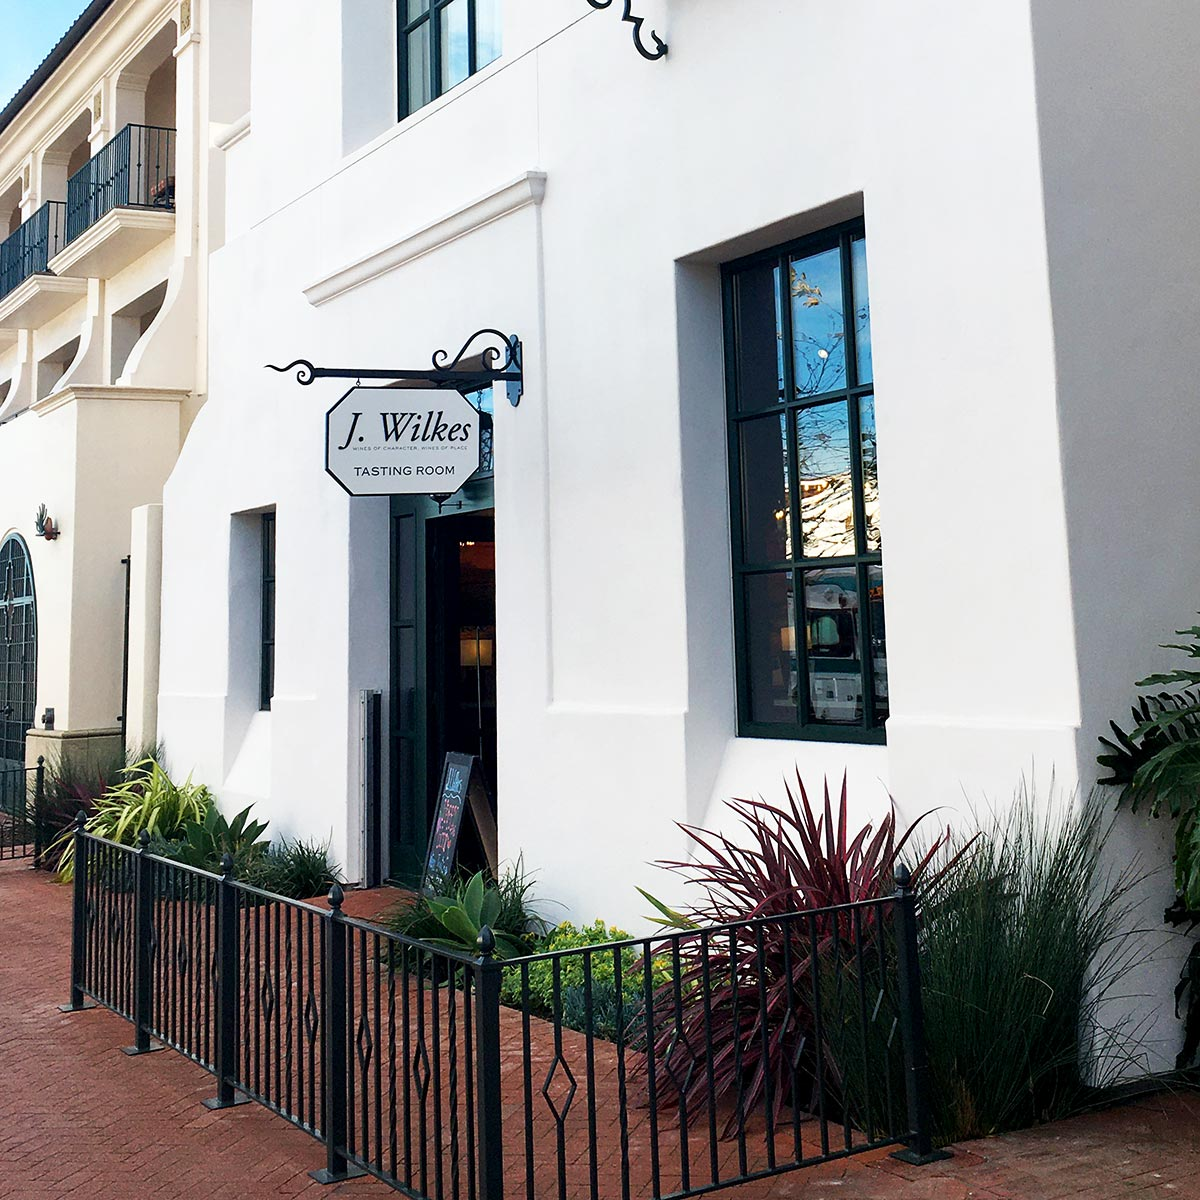 J. Wilkes Winery Tasting Room in Santa Barbara